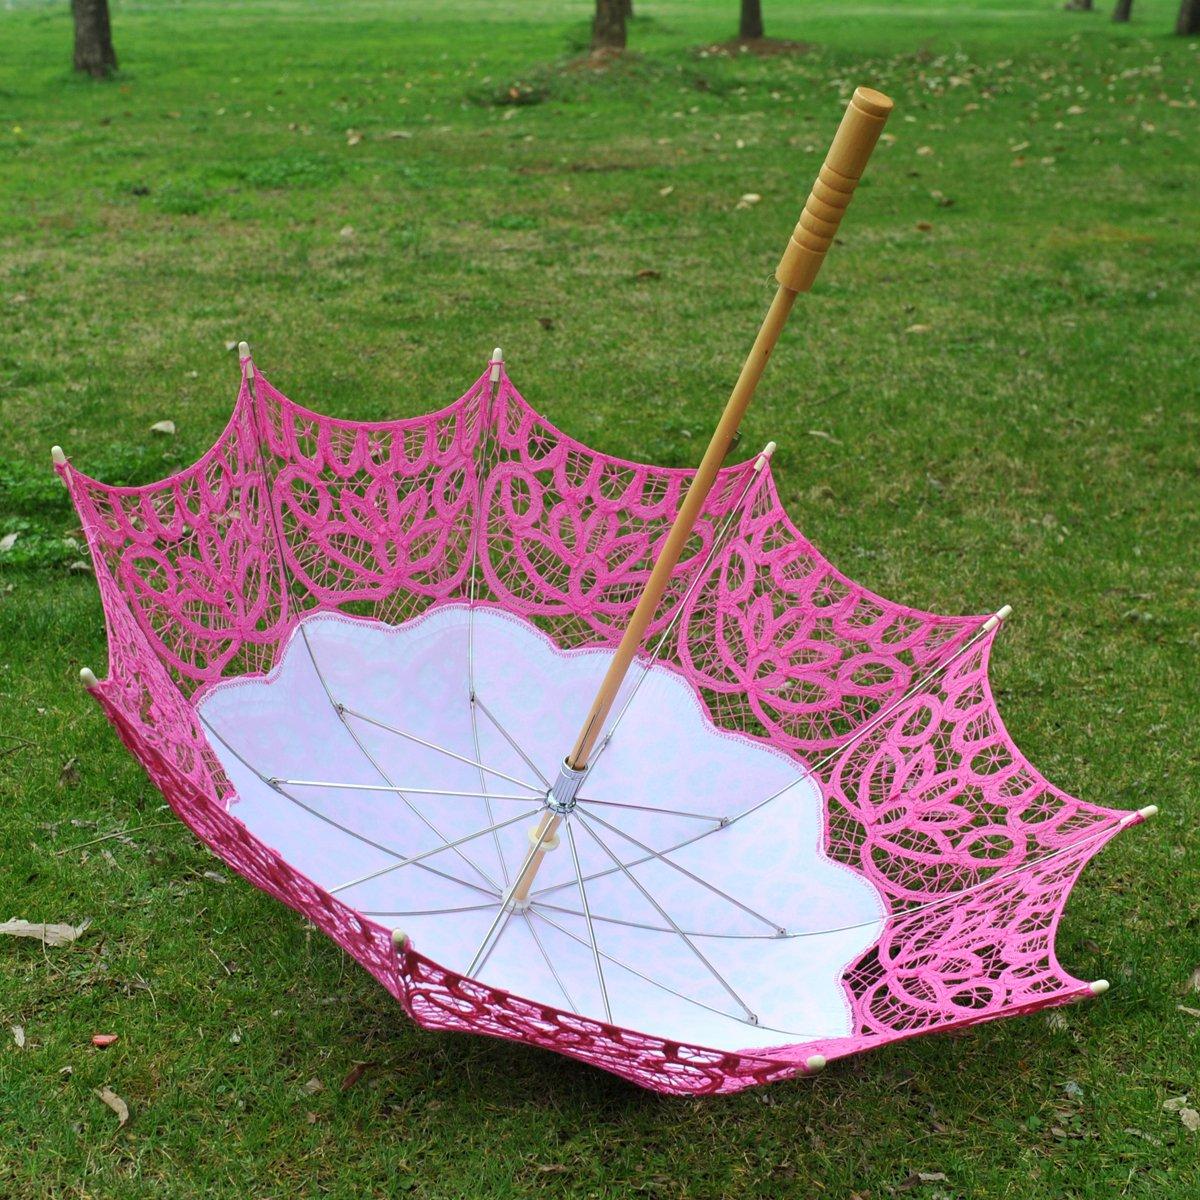 Topwedding Classic Cotton Lace Parasol Umbrella Bridal Shower Decoration, Fuschia by Topwedding (Image #9)